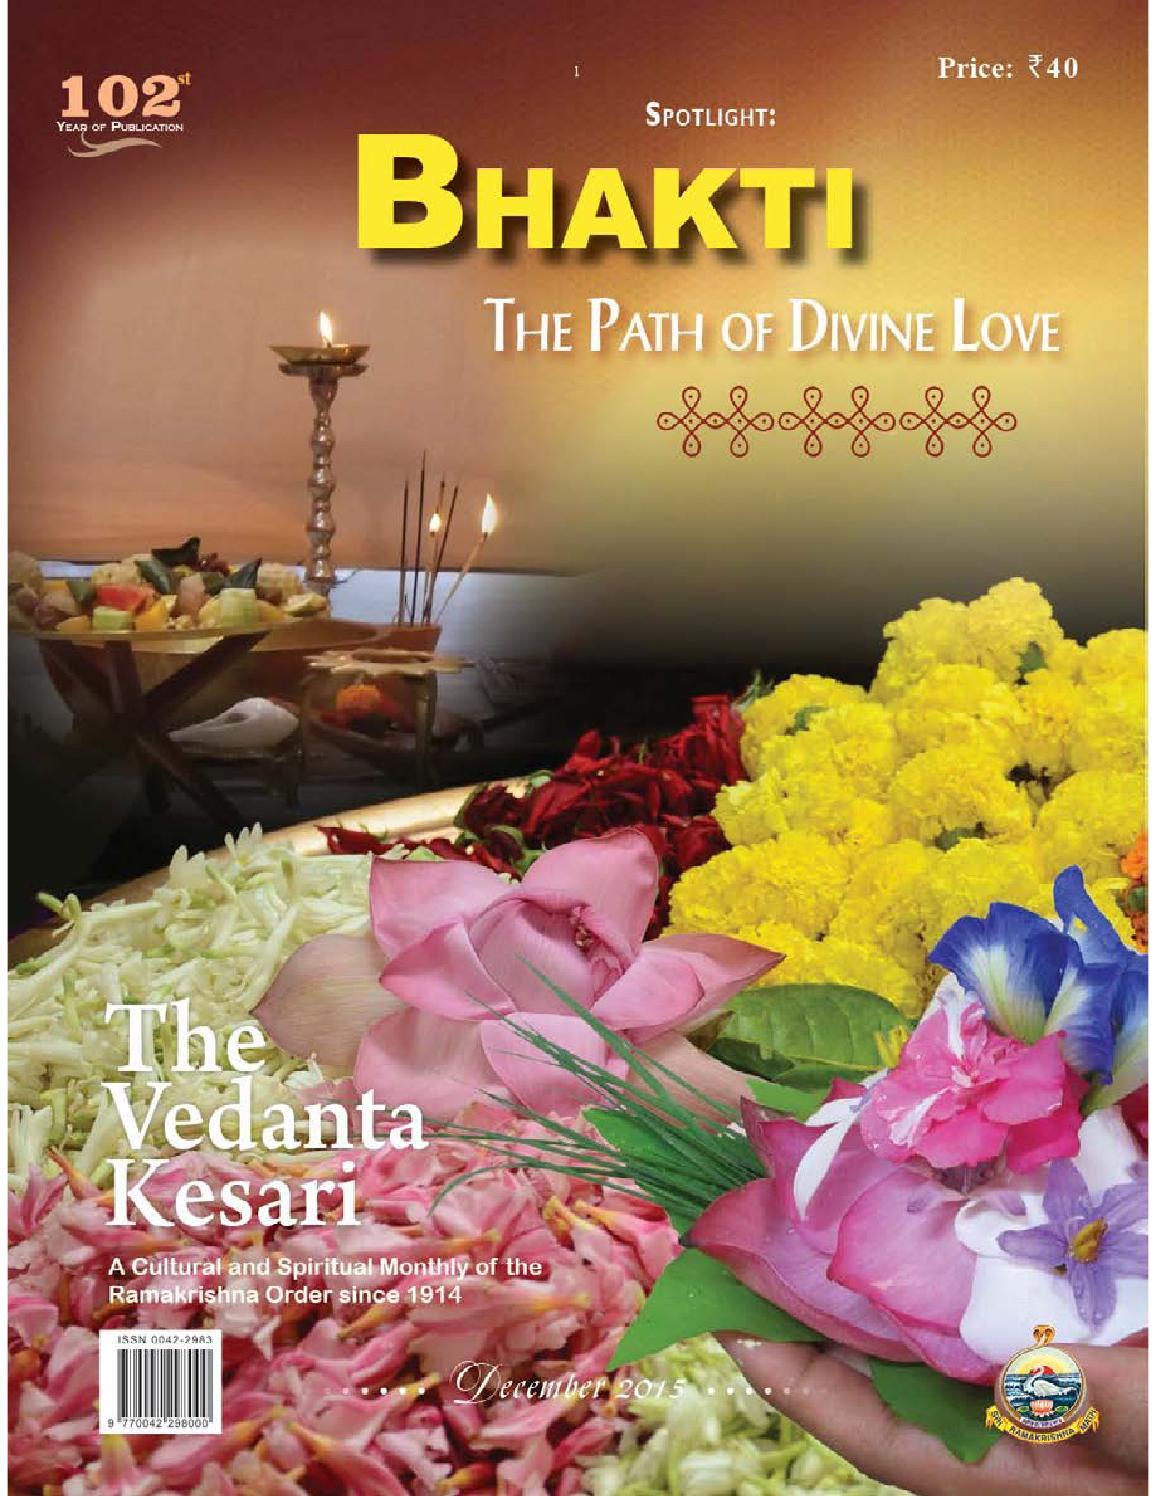 The Vedanta Kesari December 2015 Issue By Sri Ramakrishna Math Carondelet Orthopaedic Surgeons Kansas City Howrah Bridge Songs Free Chennai Issuu